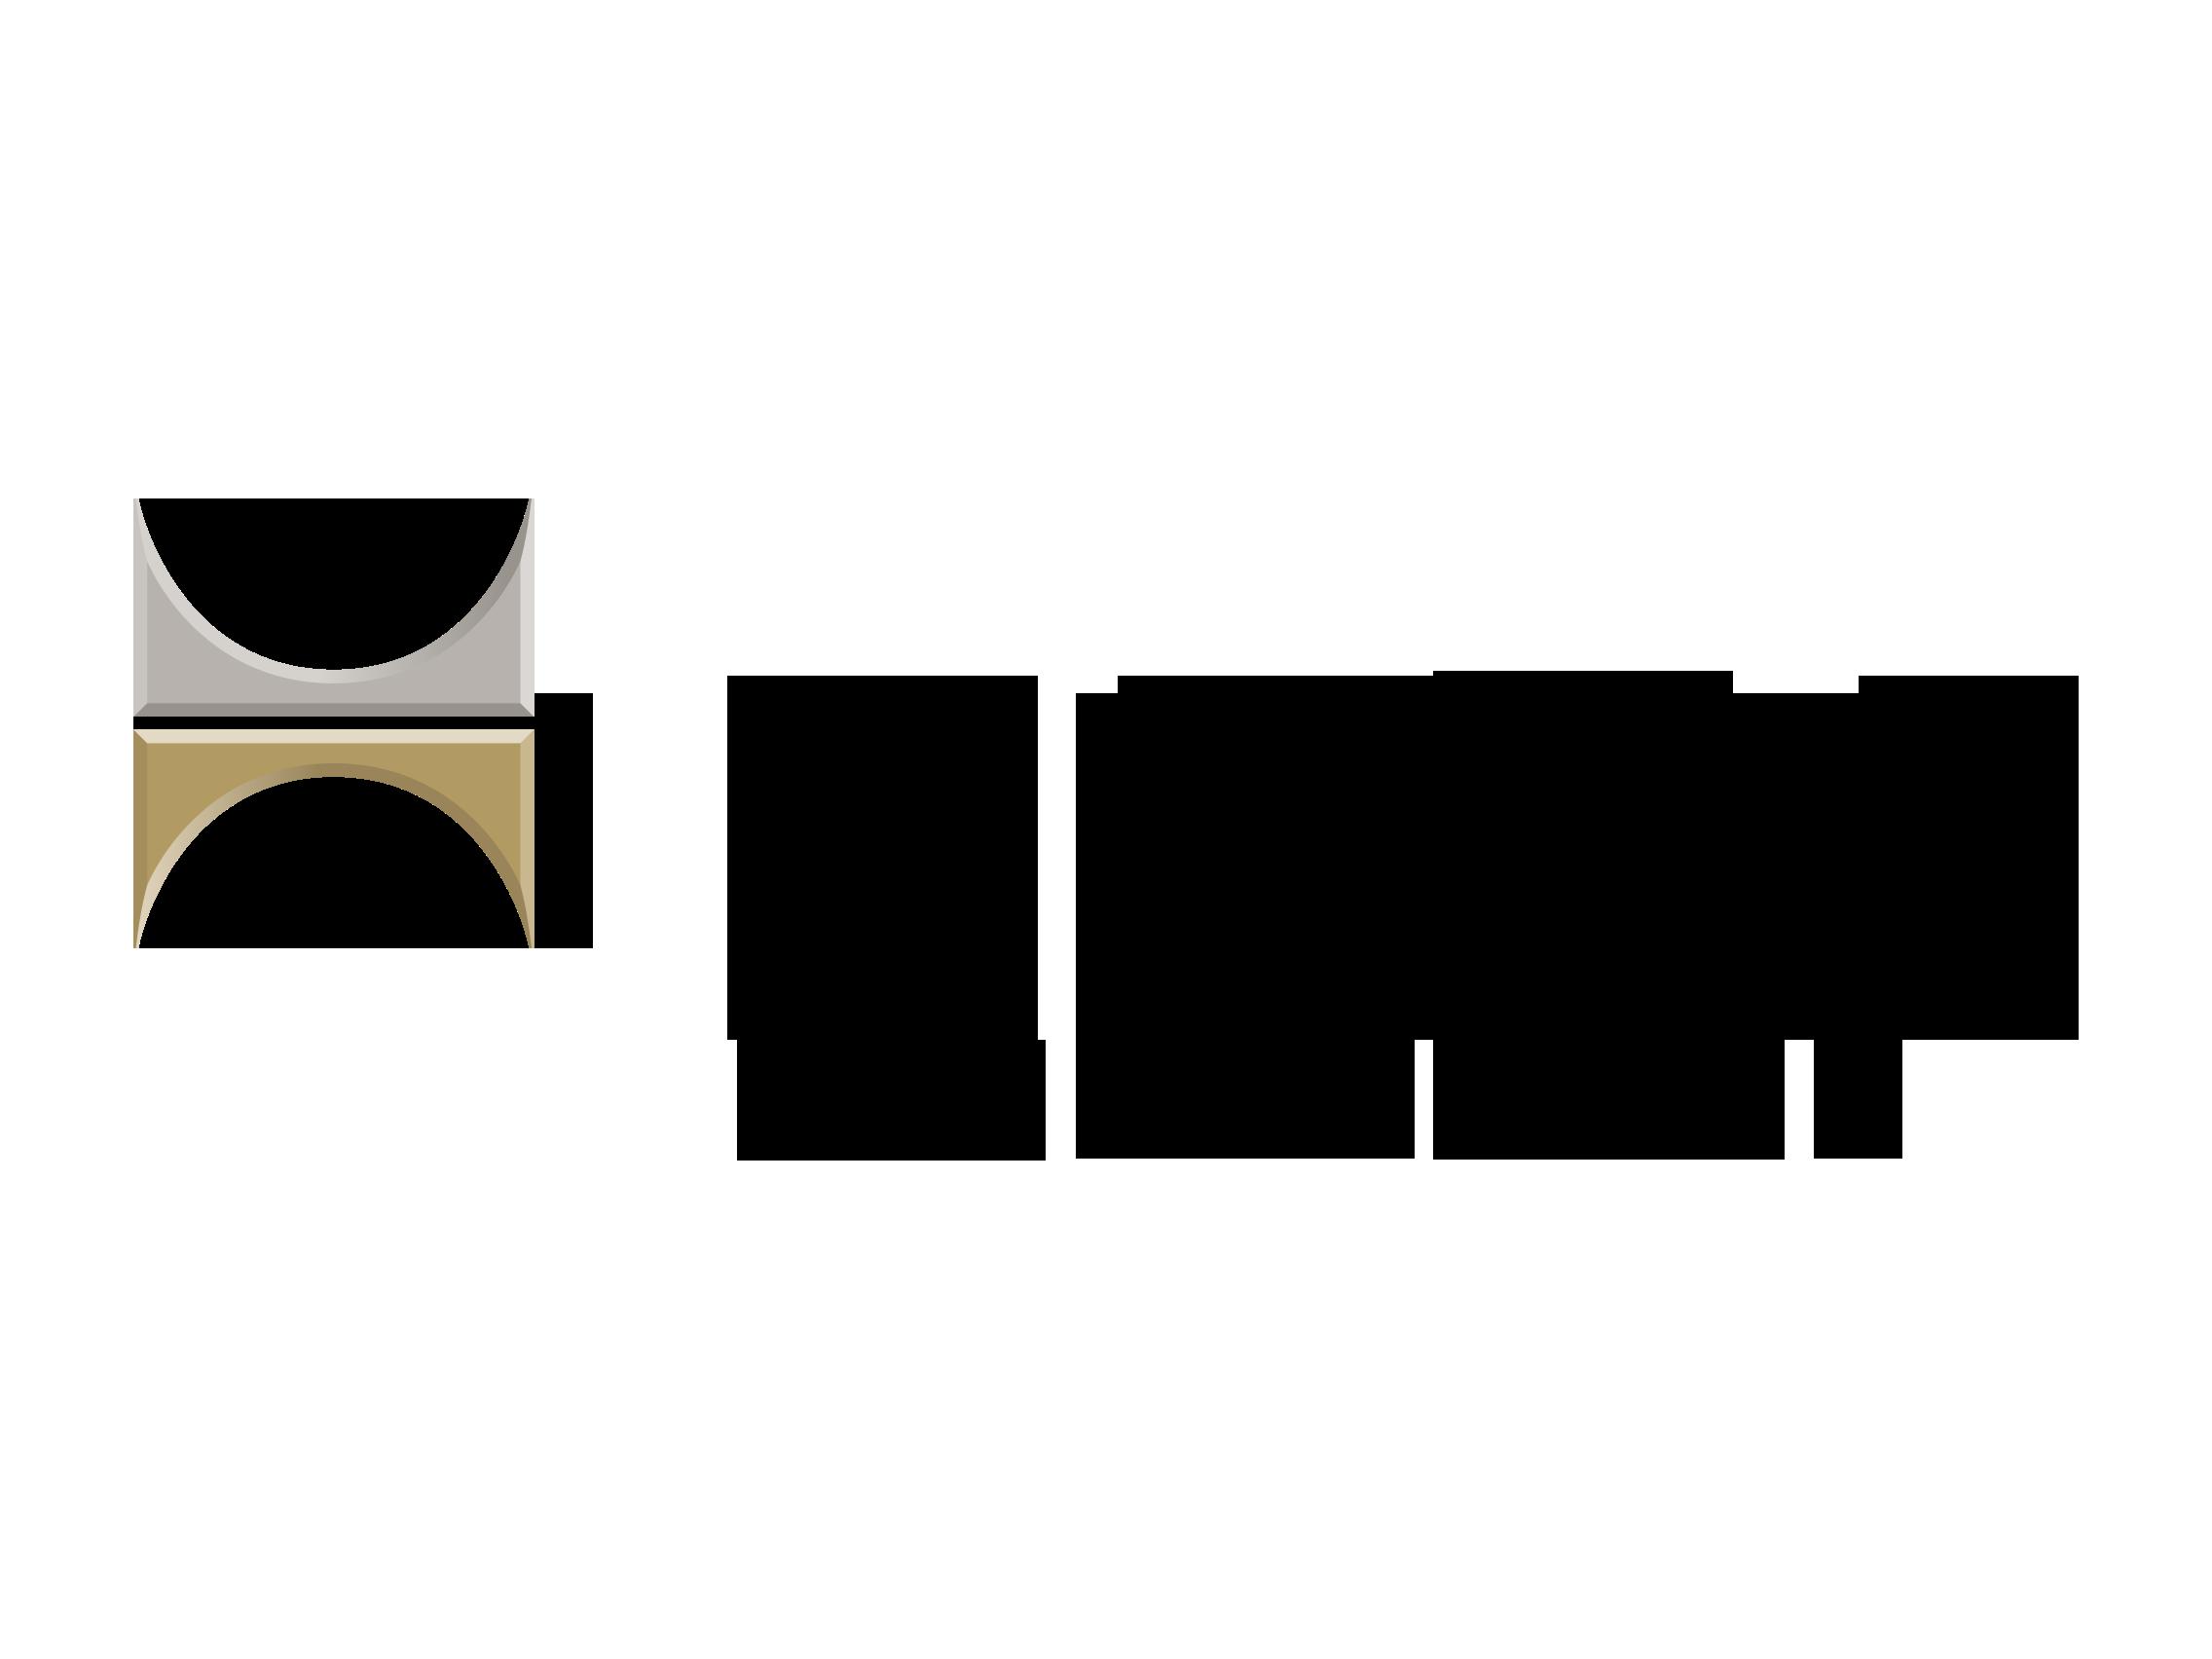 Hilton-Worldwide-logo-and-wordmark.png